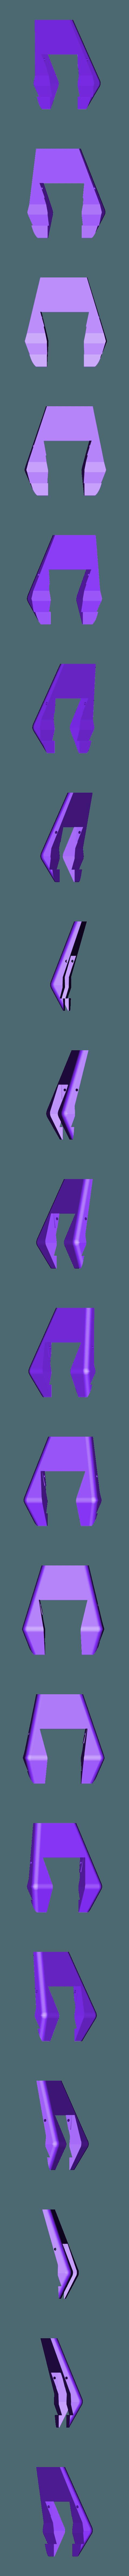 Pièce 8.STL Download STL file Translocator Sombra • 3D print model, Midnight_05